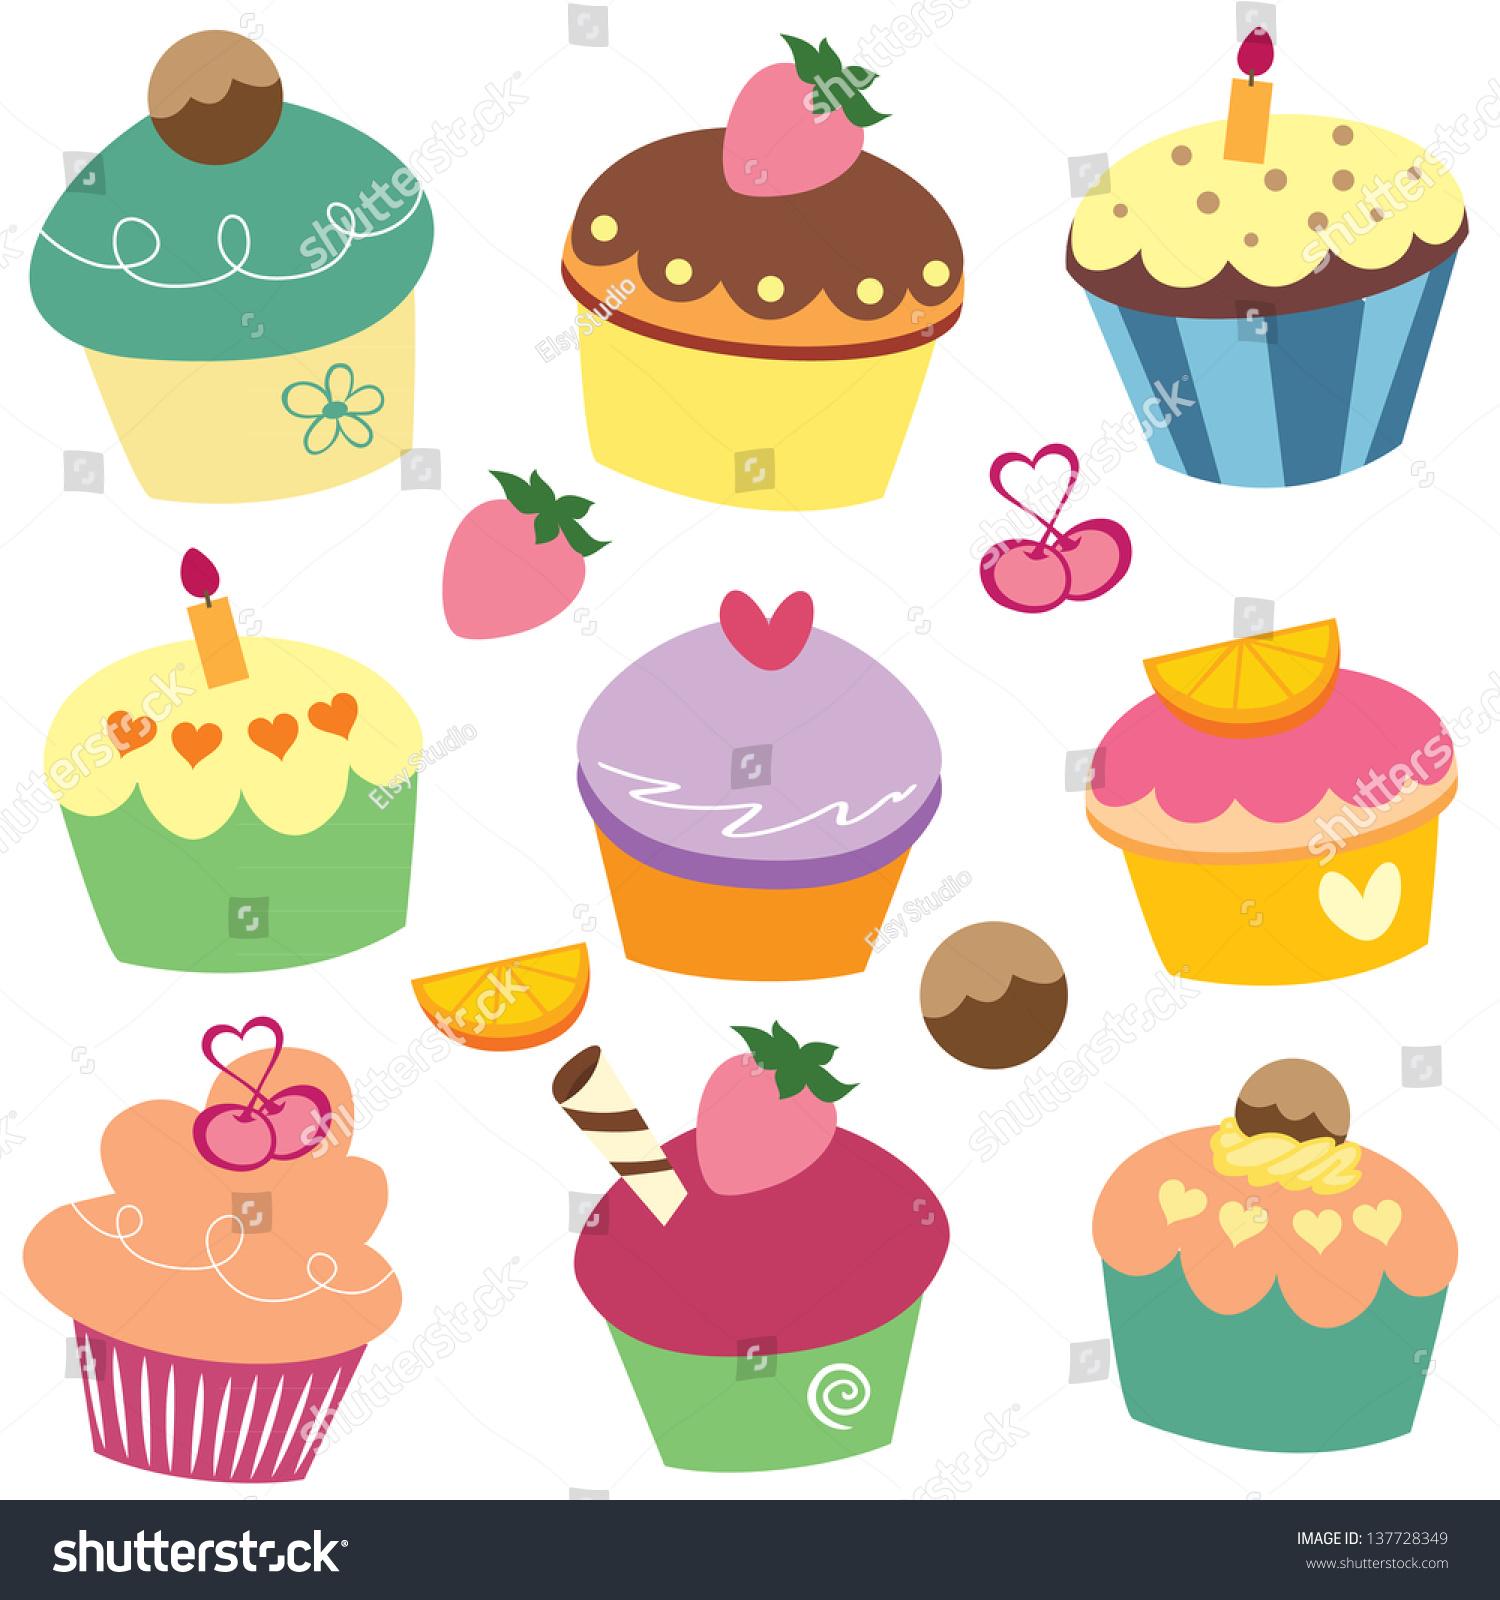 Yummy Cake Clipart : Yummy Cupcakes Clip Art Stock Vector 137728349 - Shutterstock